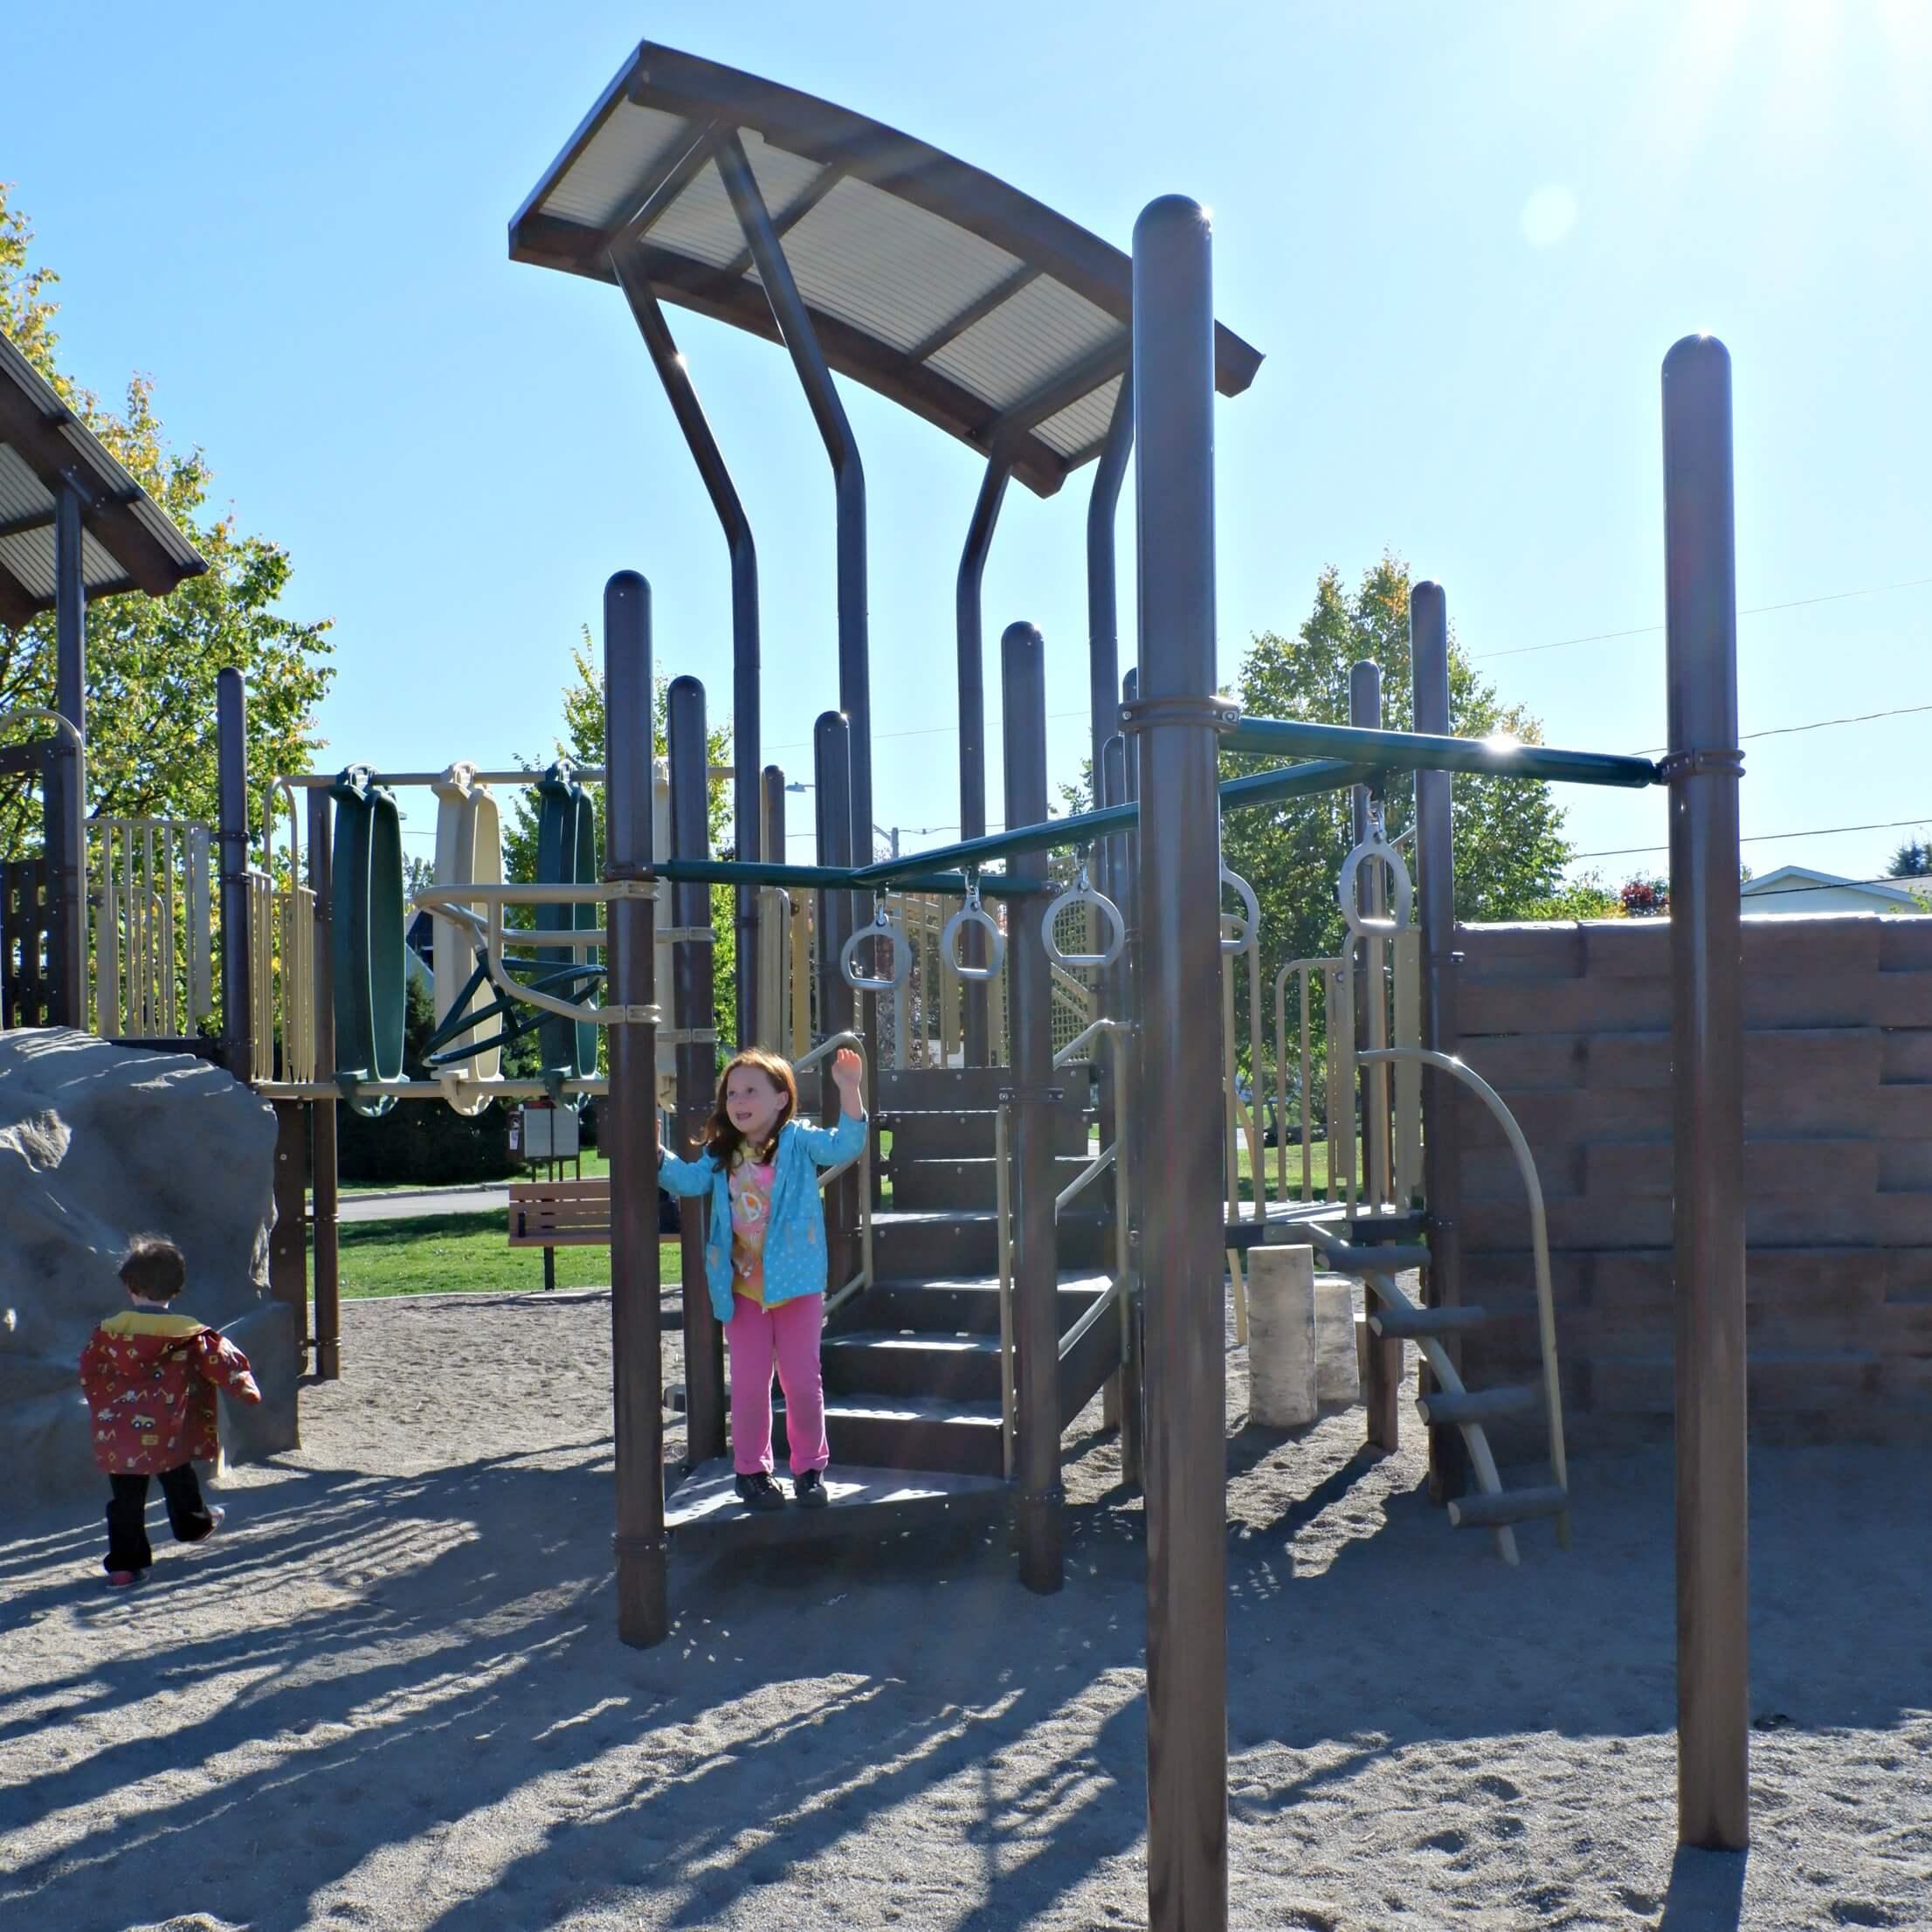 maplehurst park playground moncton riverview dieppe best play new brunswick